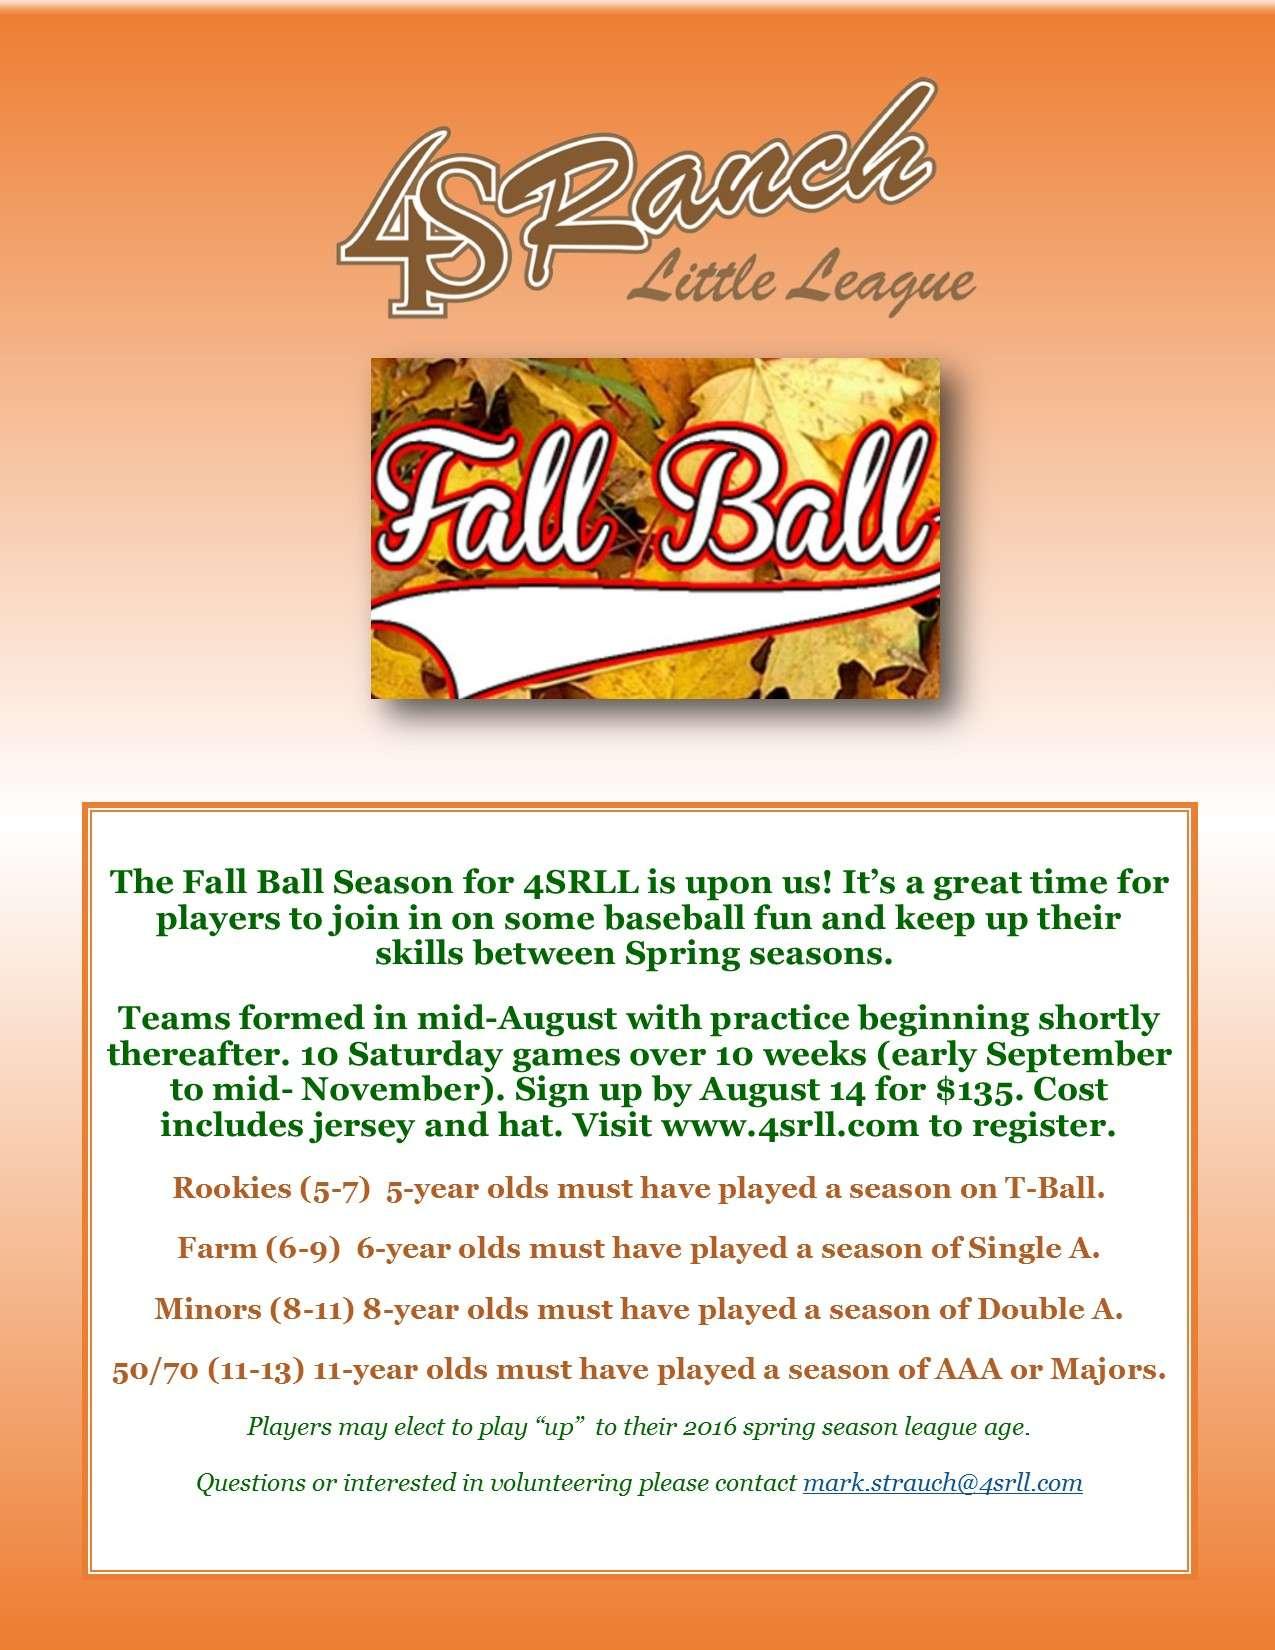 Fall Ball 3_2015